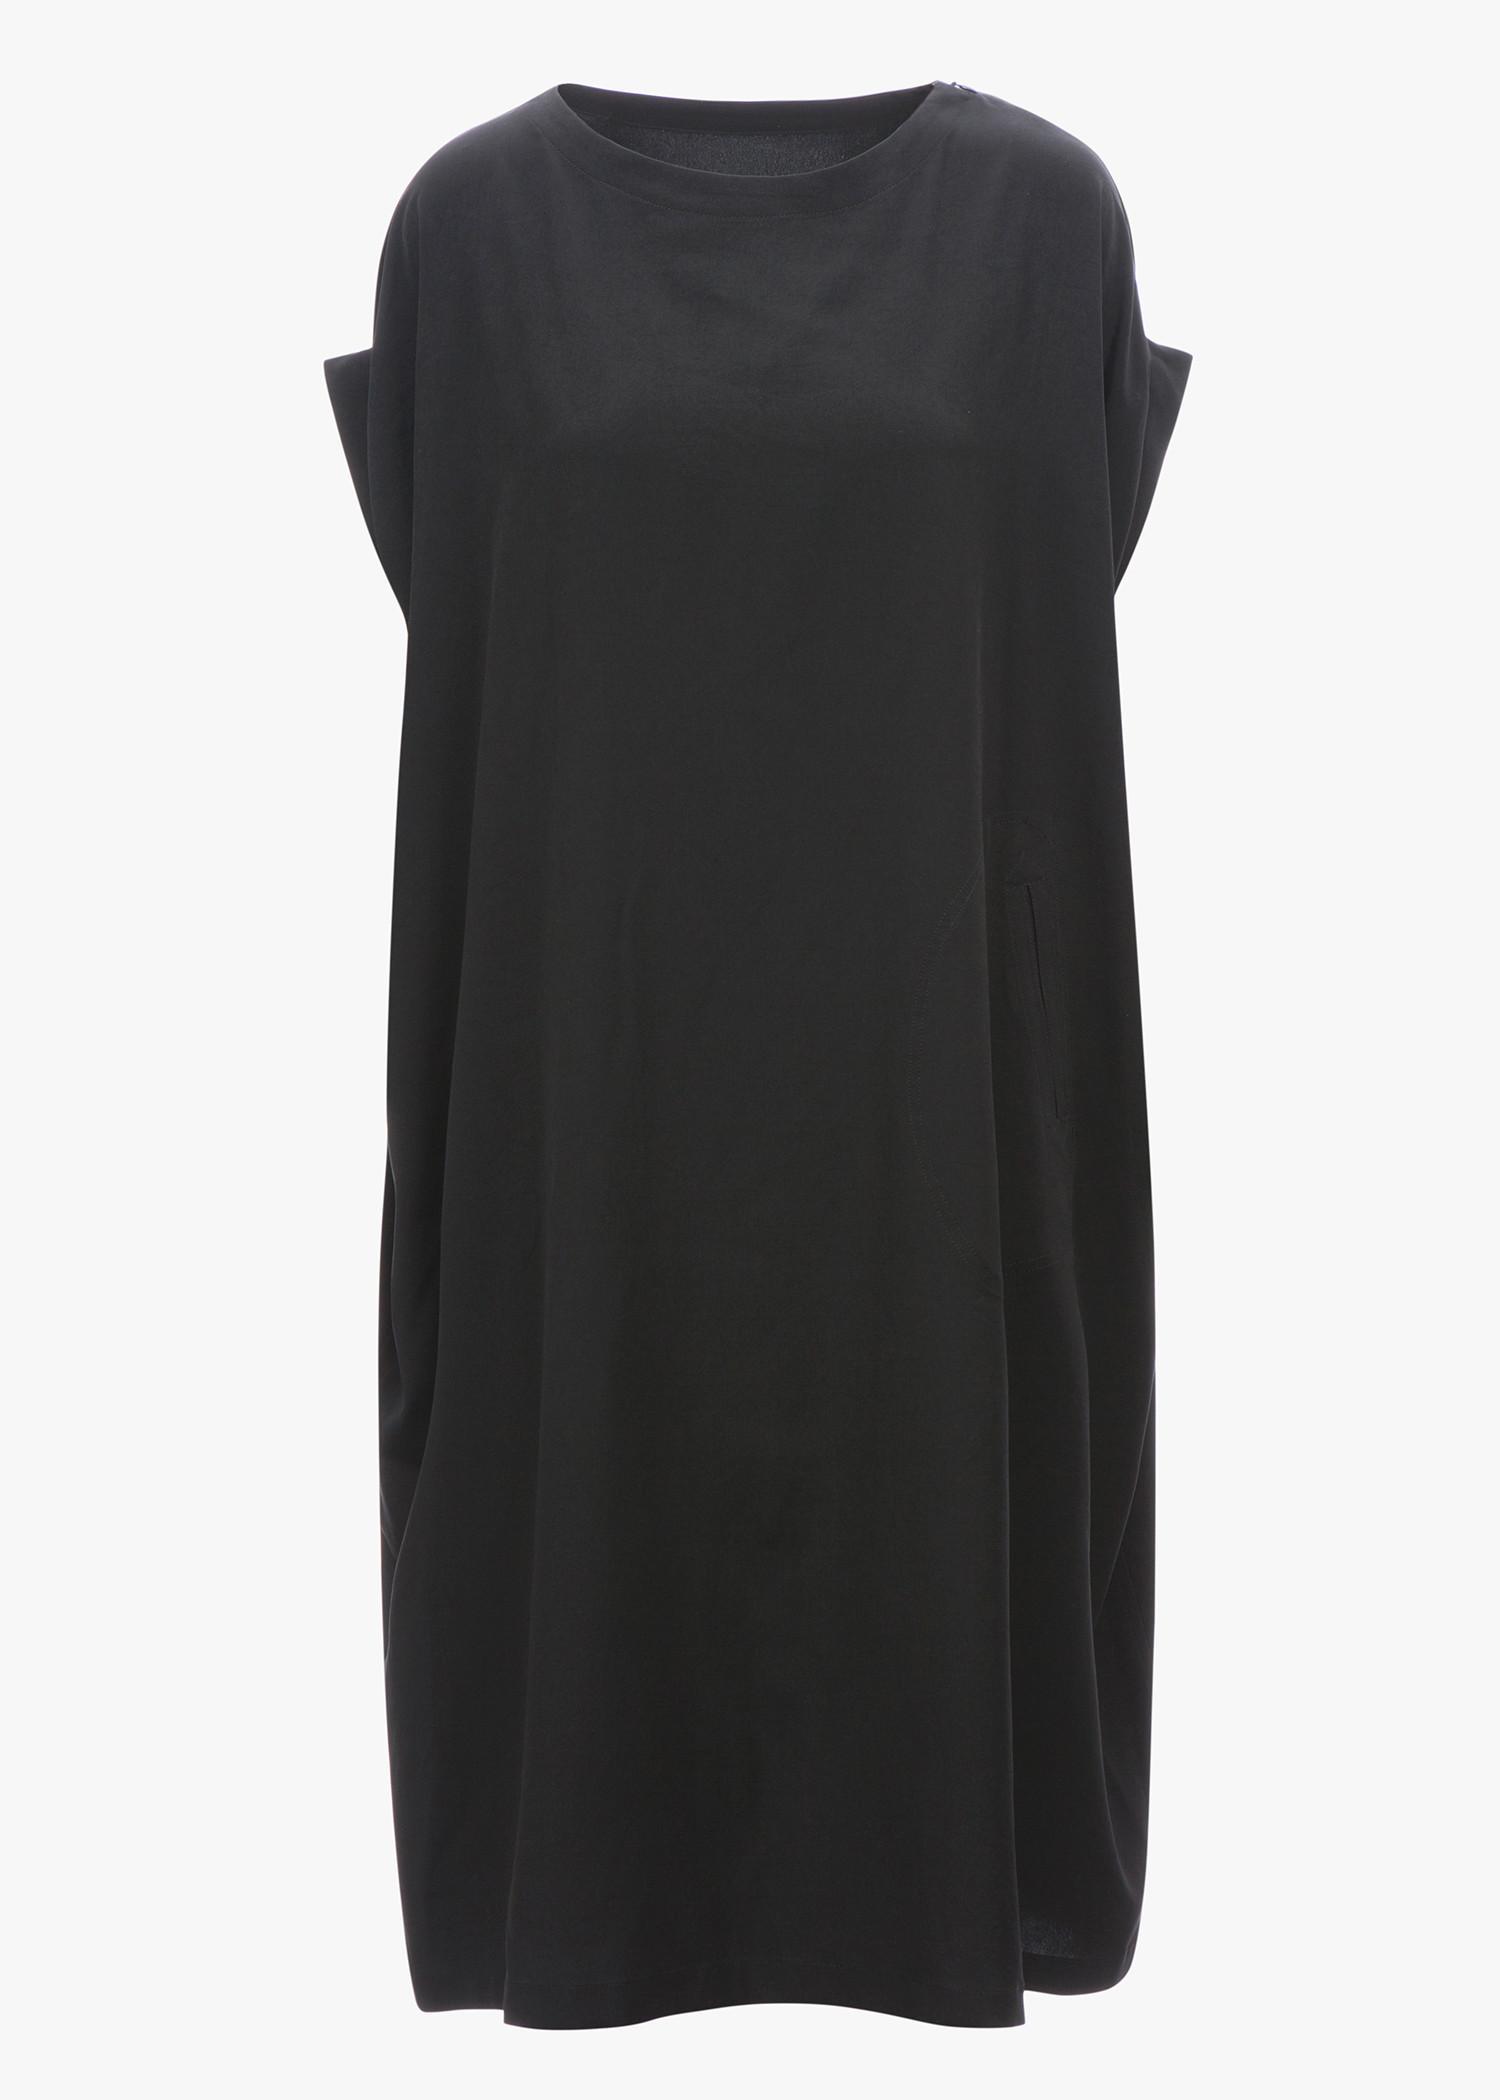 Y's Mini Sleeve Dress In Black